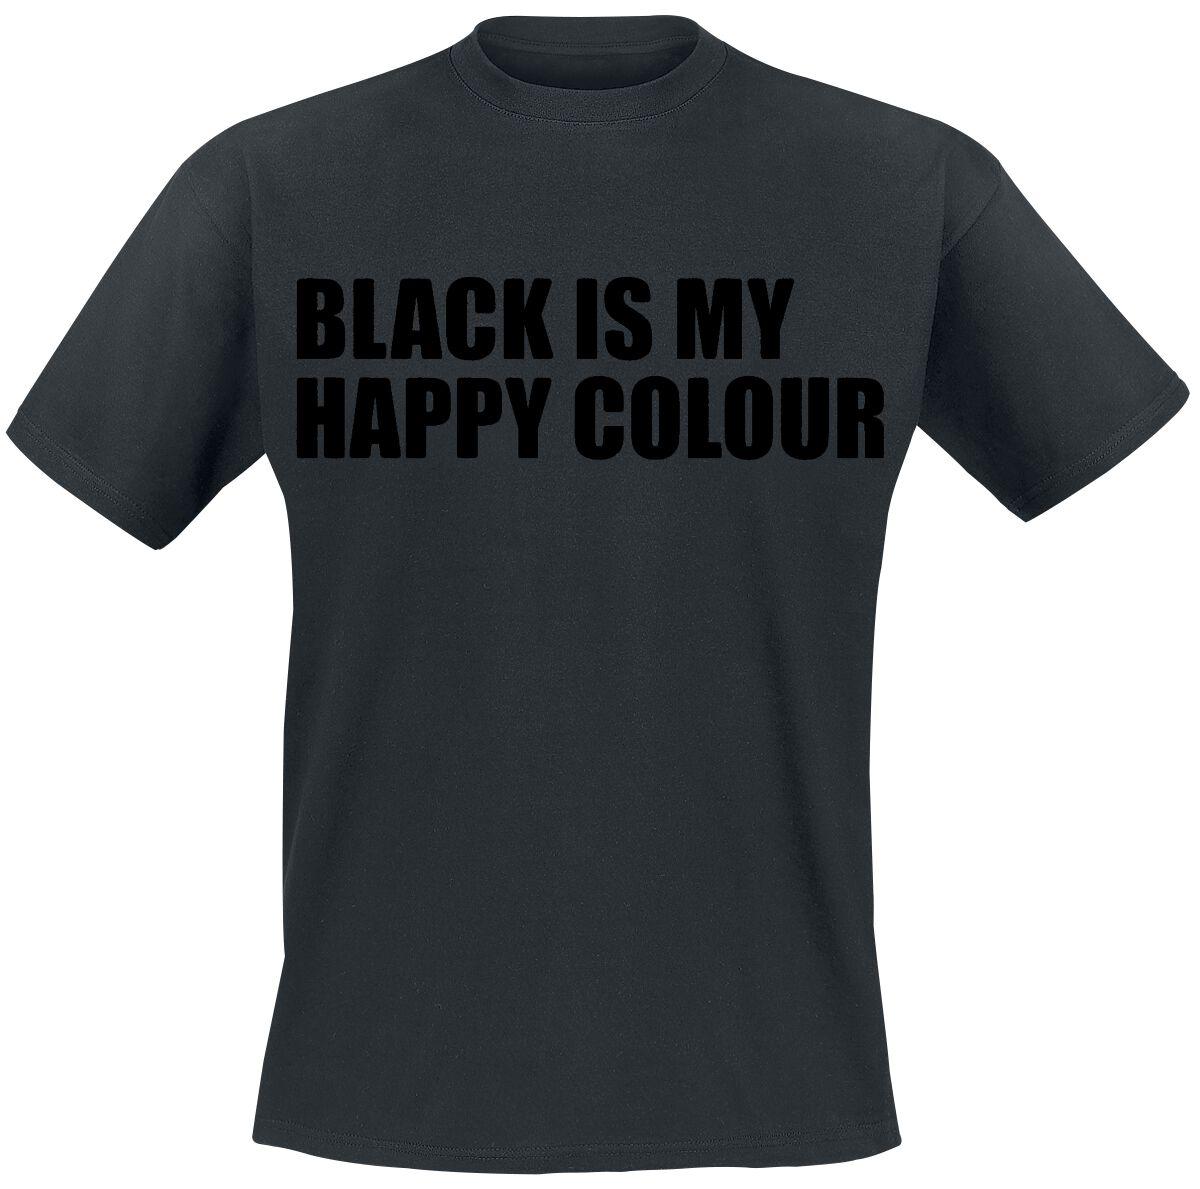 Fun Shirts - Koszulki - T-Shirt Black Is My Happy Colour T-Shirt czarny - 332306